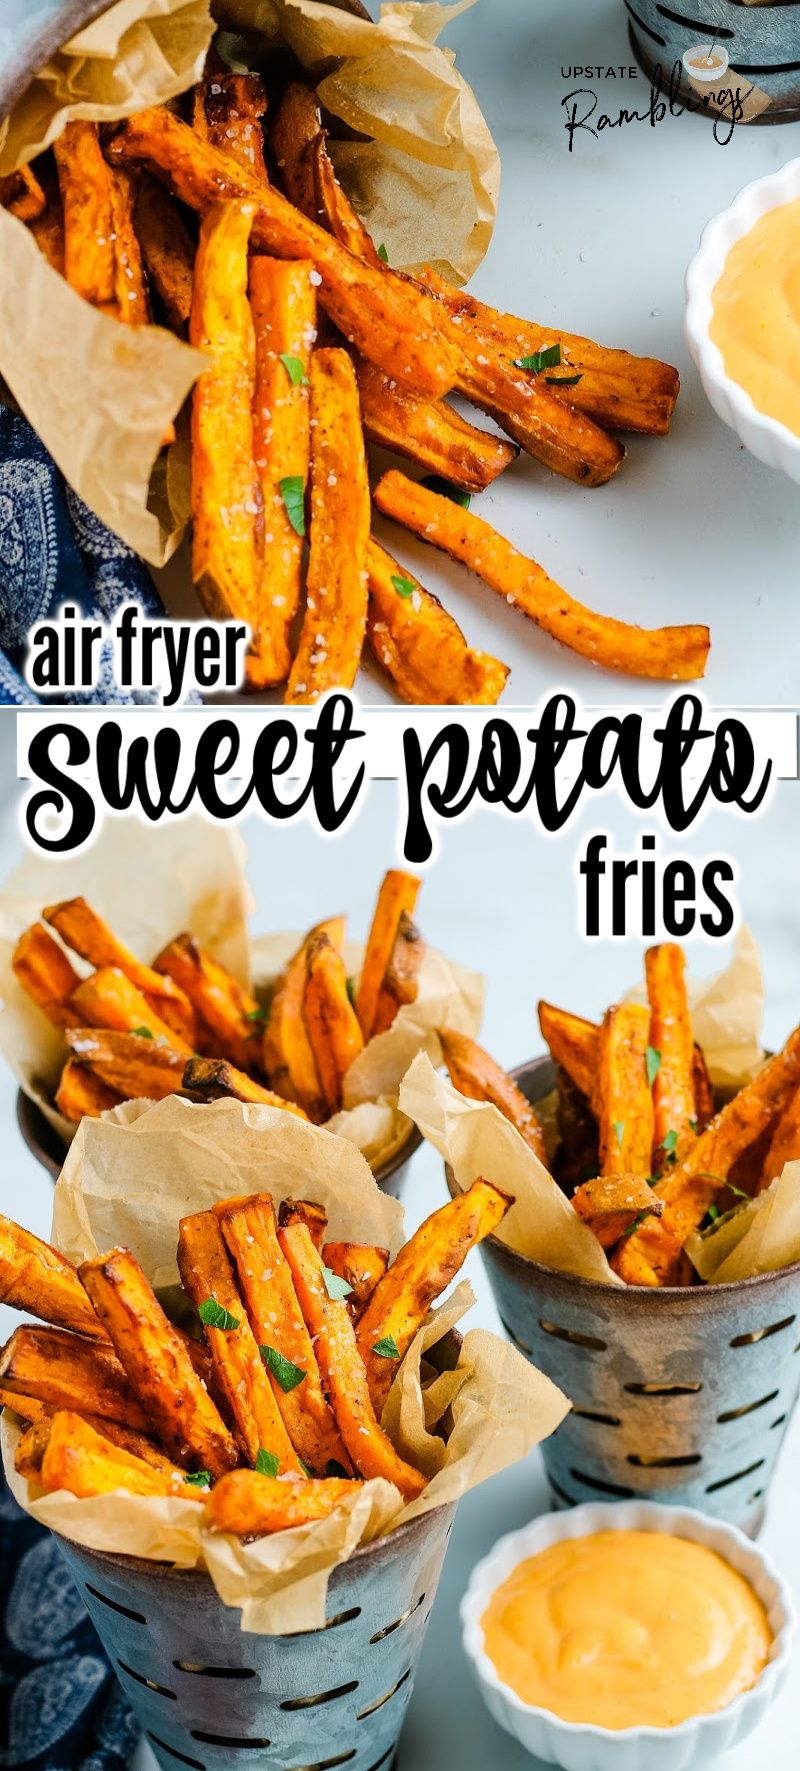 Air Fryer Sweet Potato Fries Air fryer recipes healthy